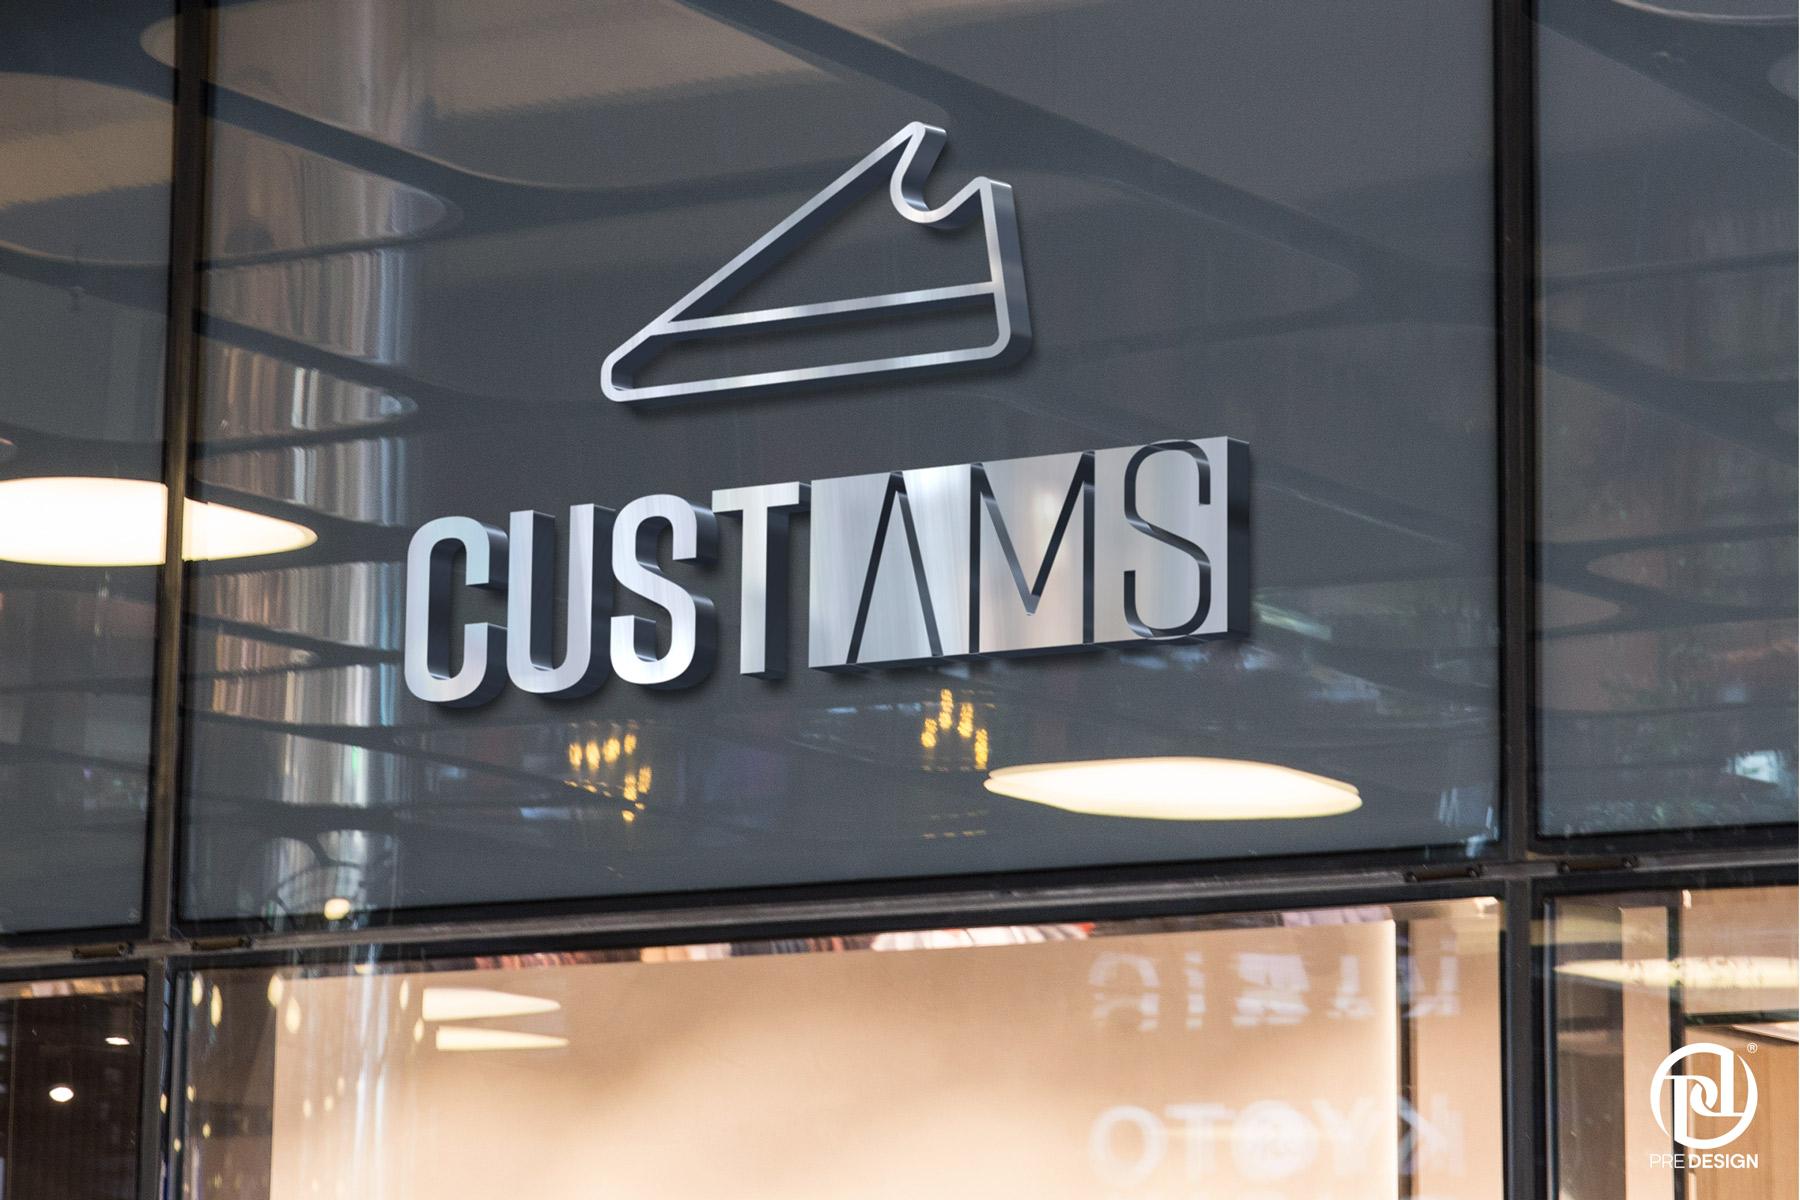 CustAms